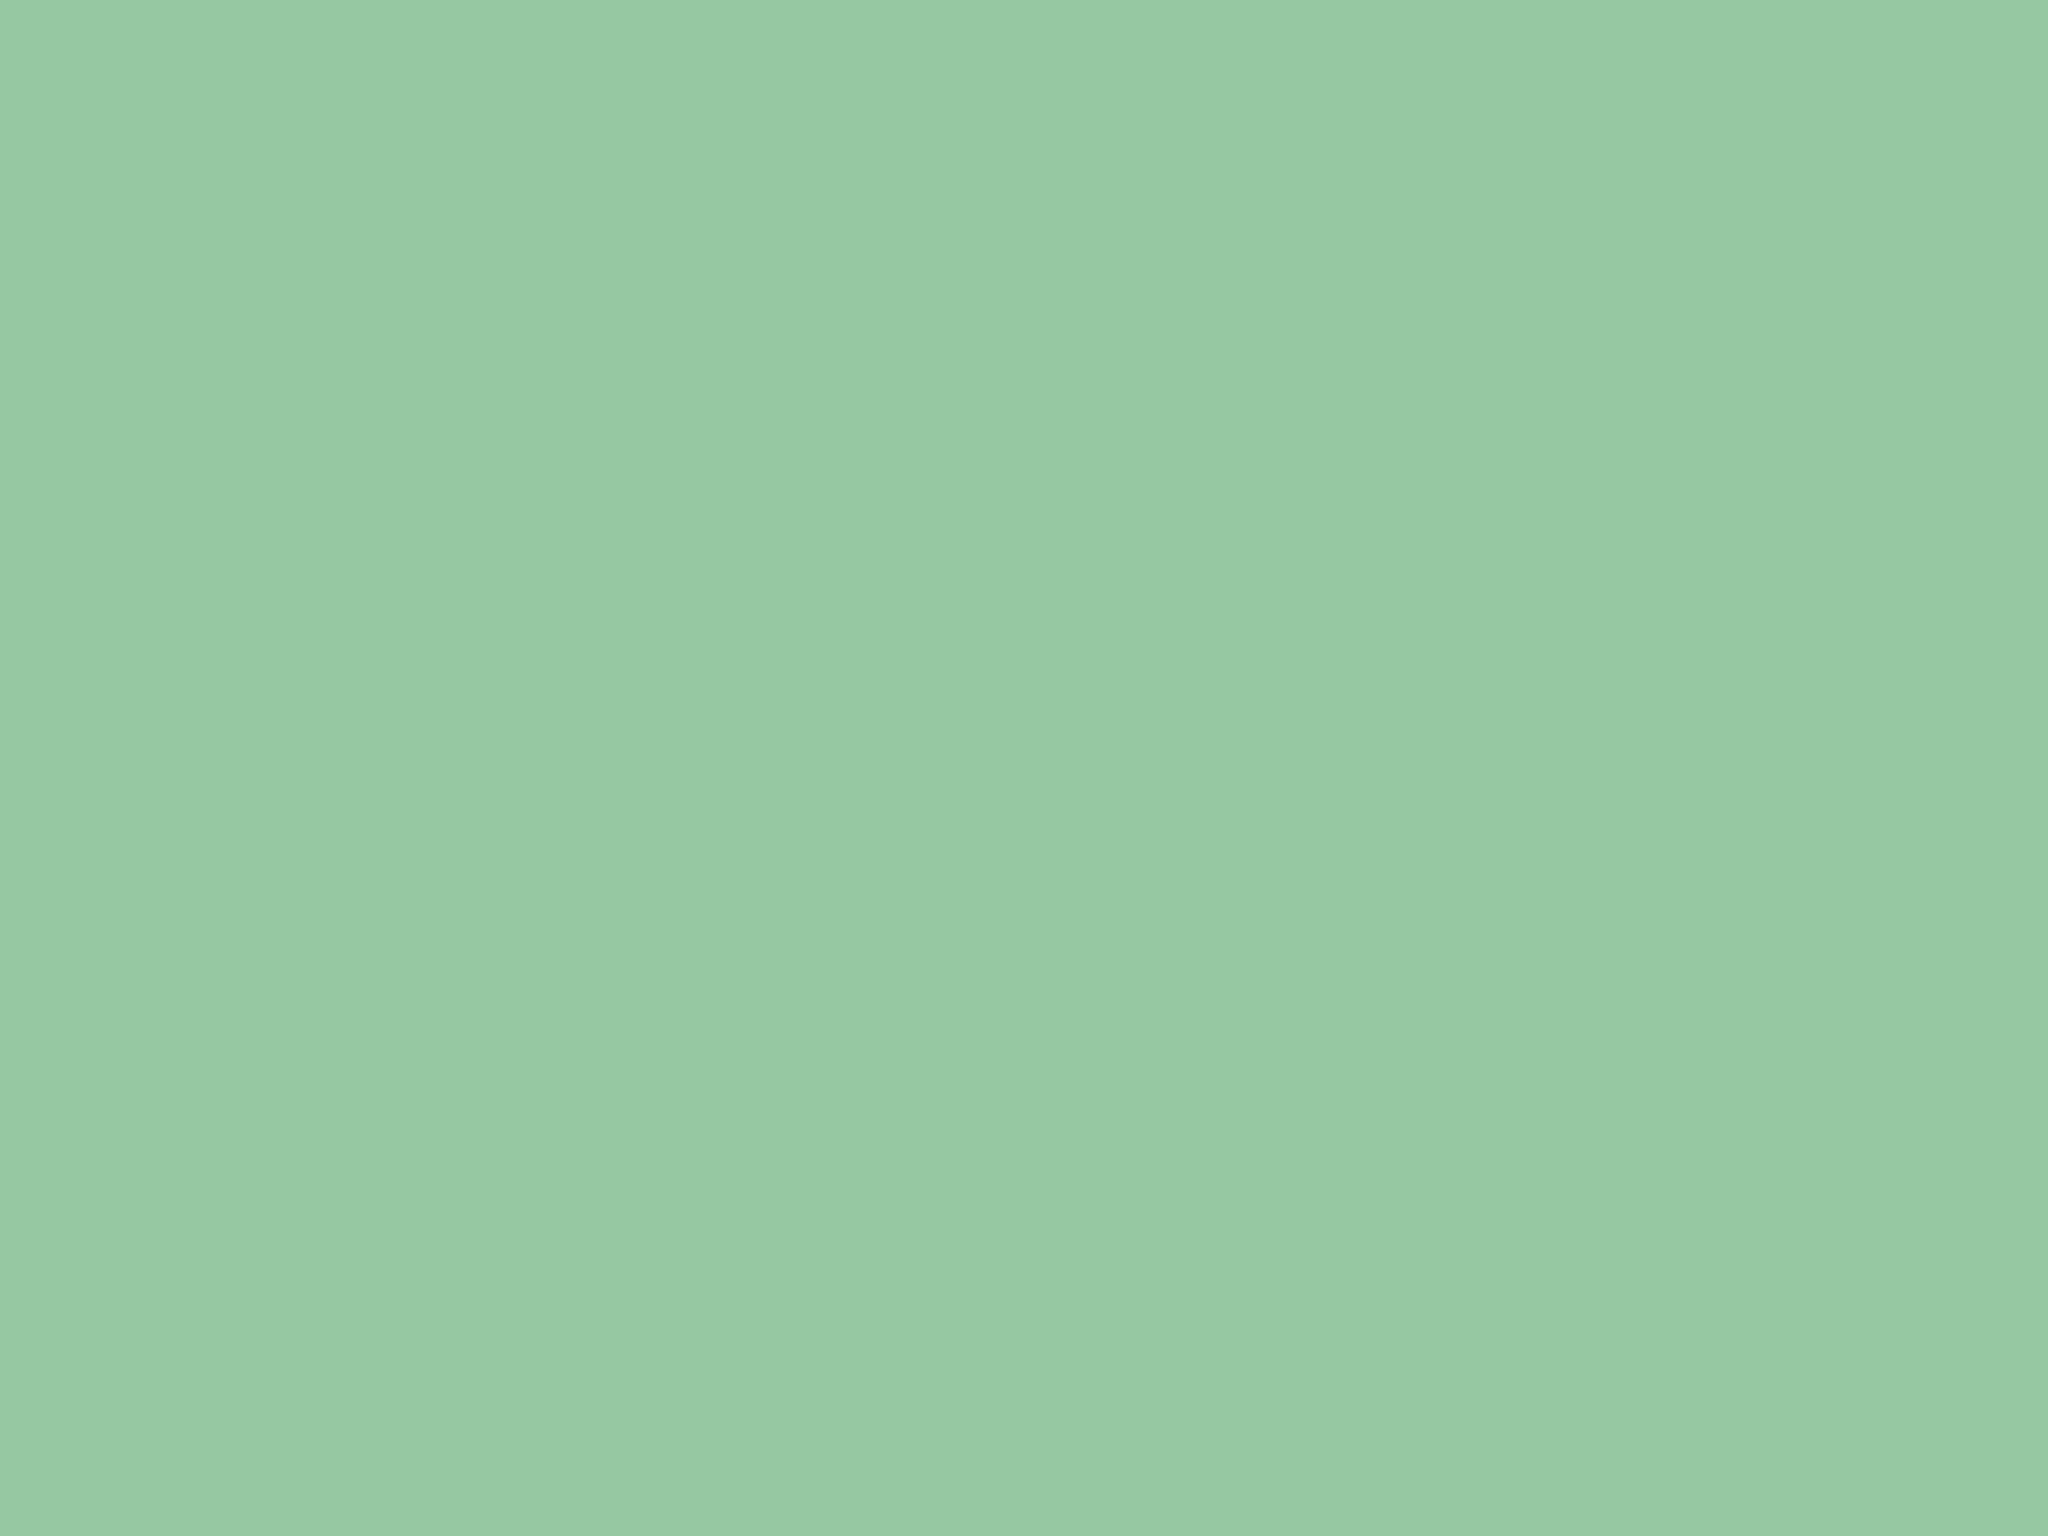 2048x1536 Eton Blue Solid Color Background